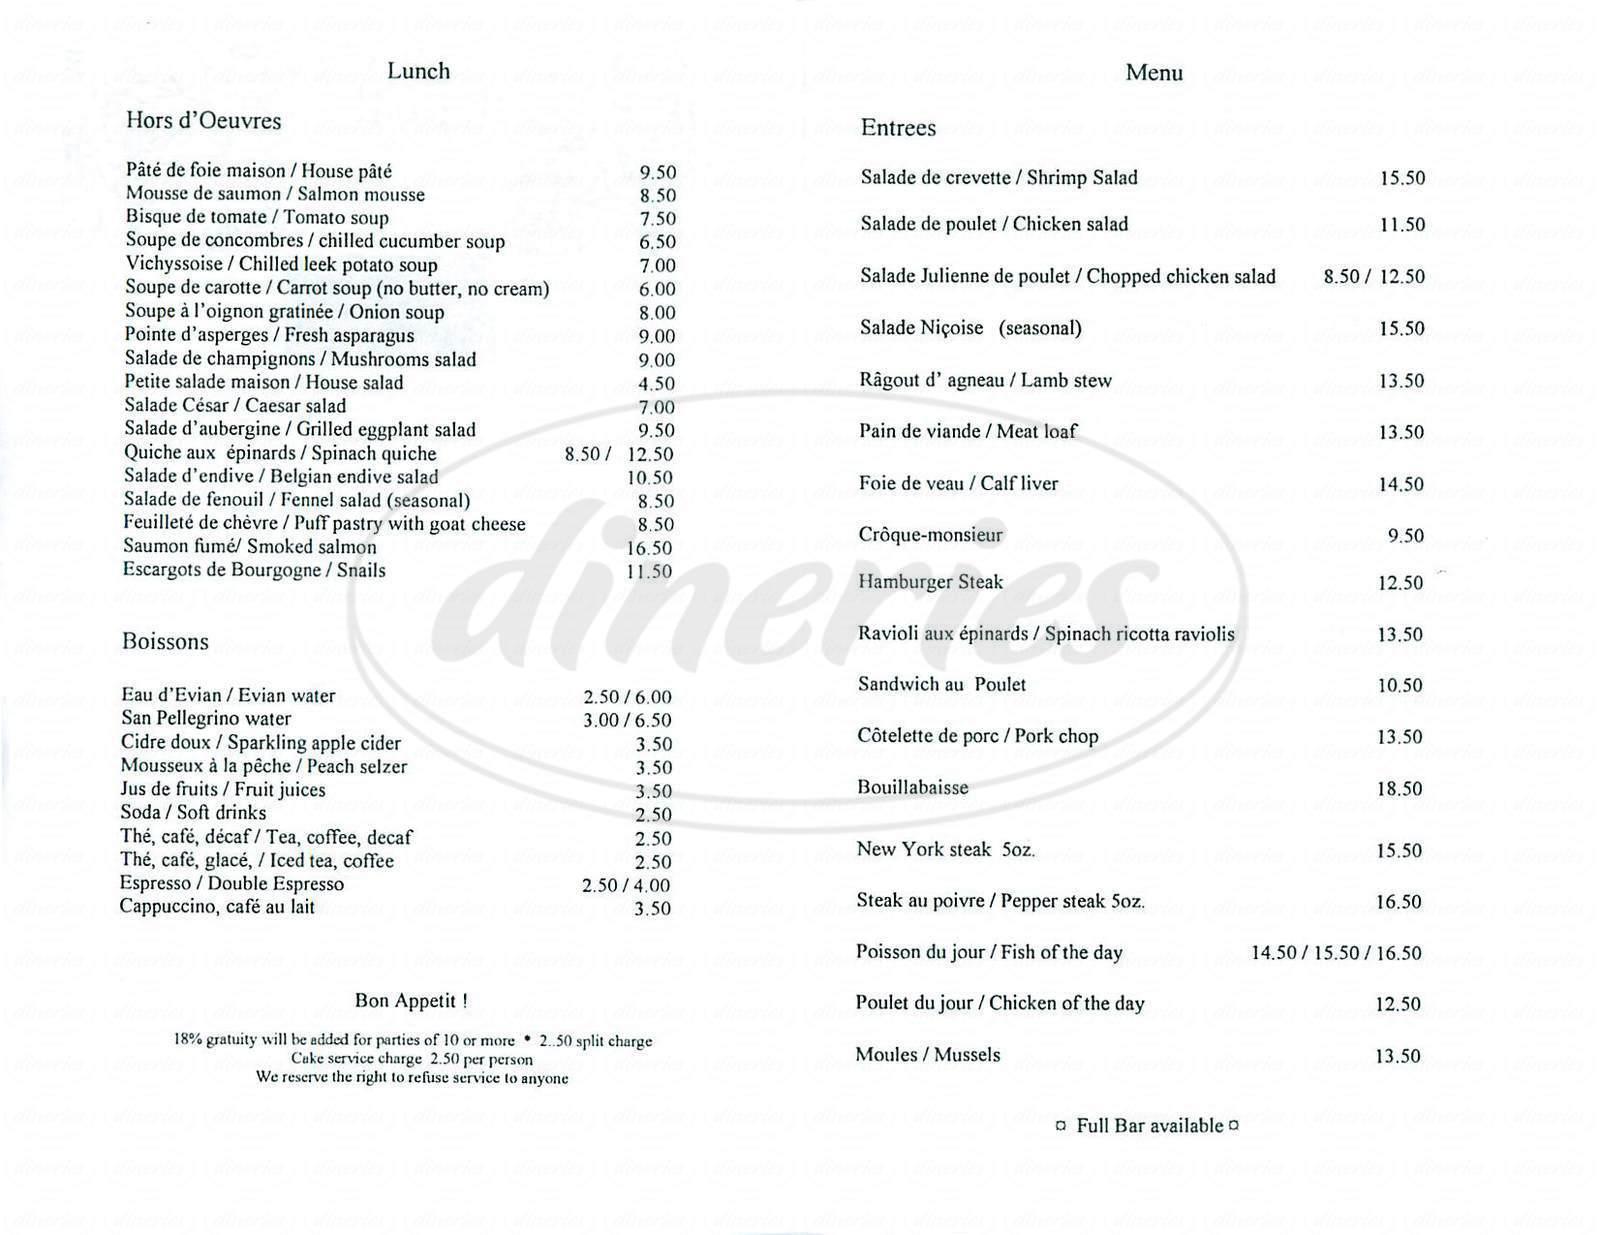 menu for Chez Mimi